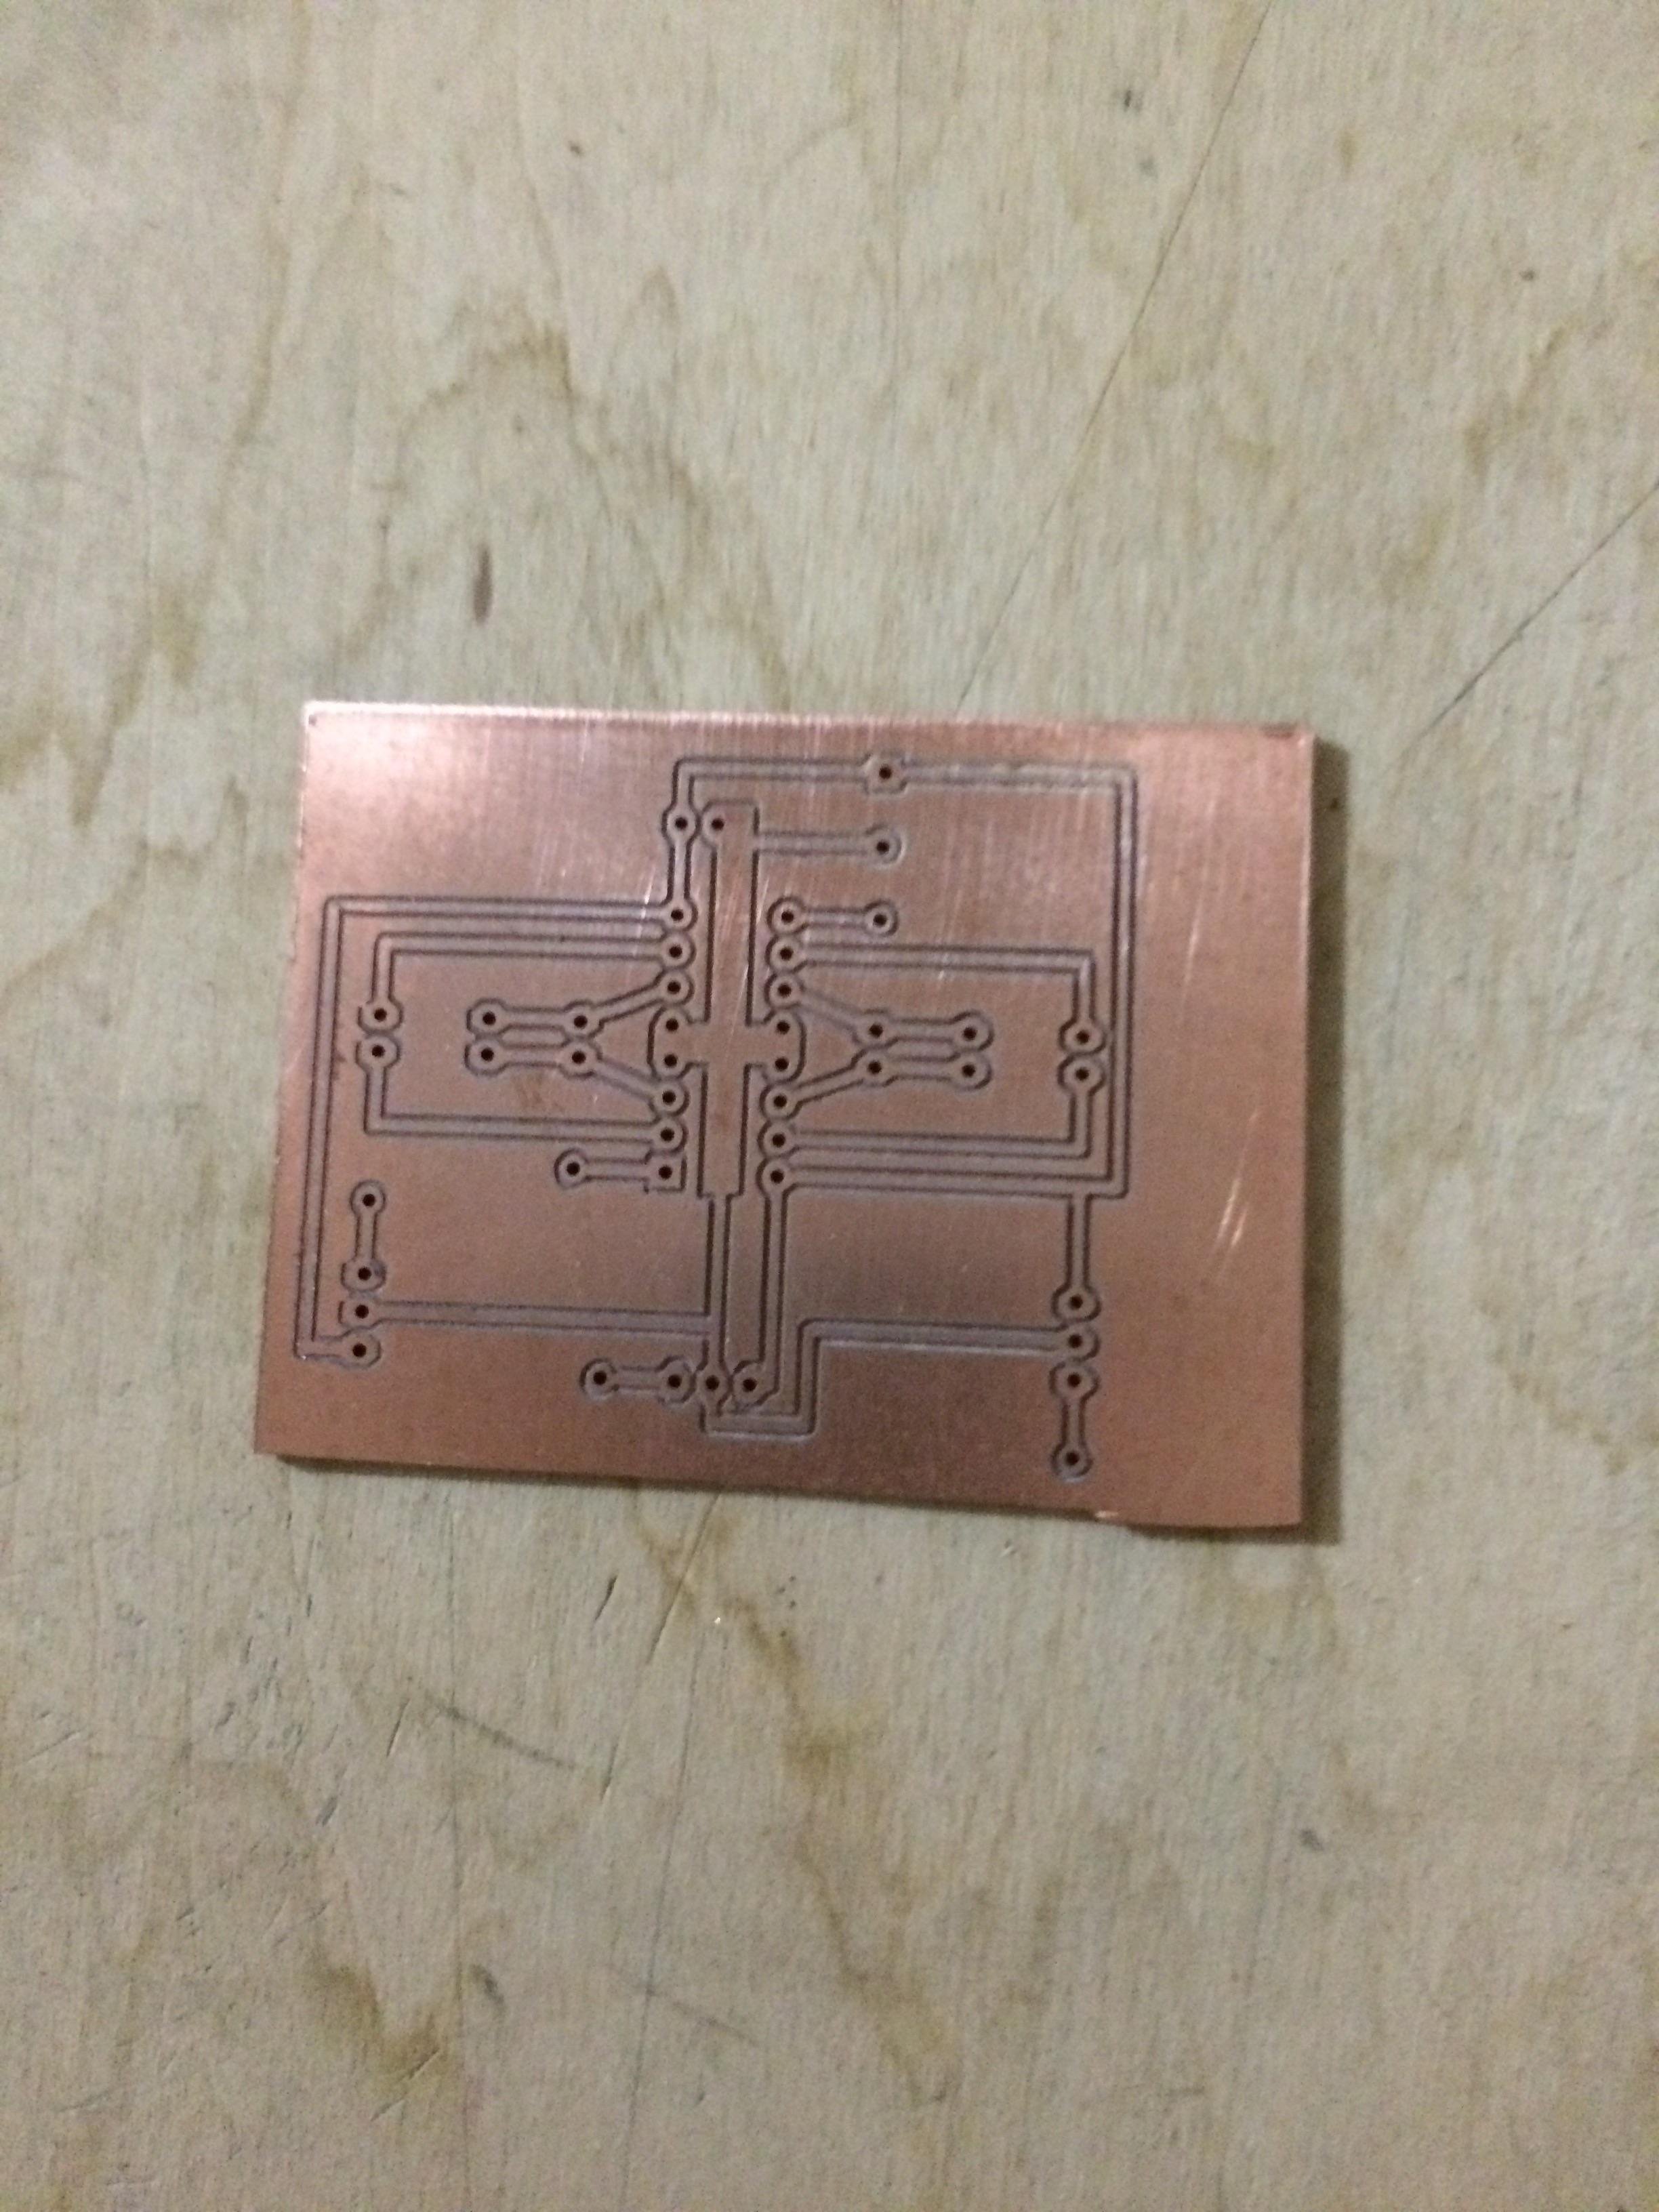 Printed Circuit Board Designer Resume Images